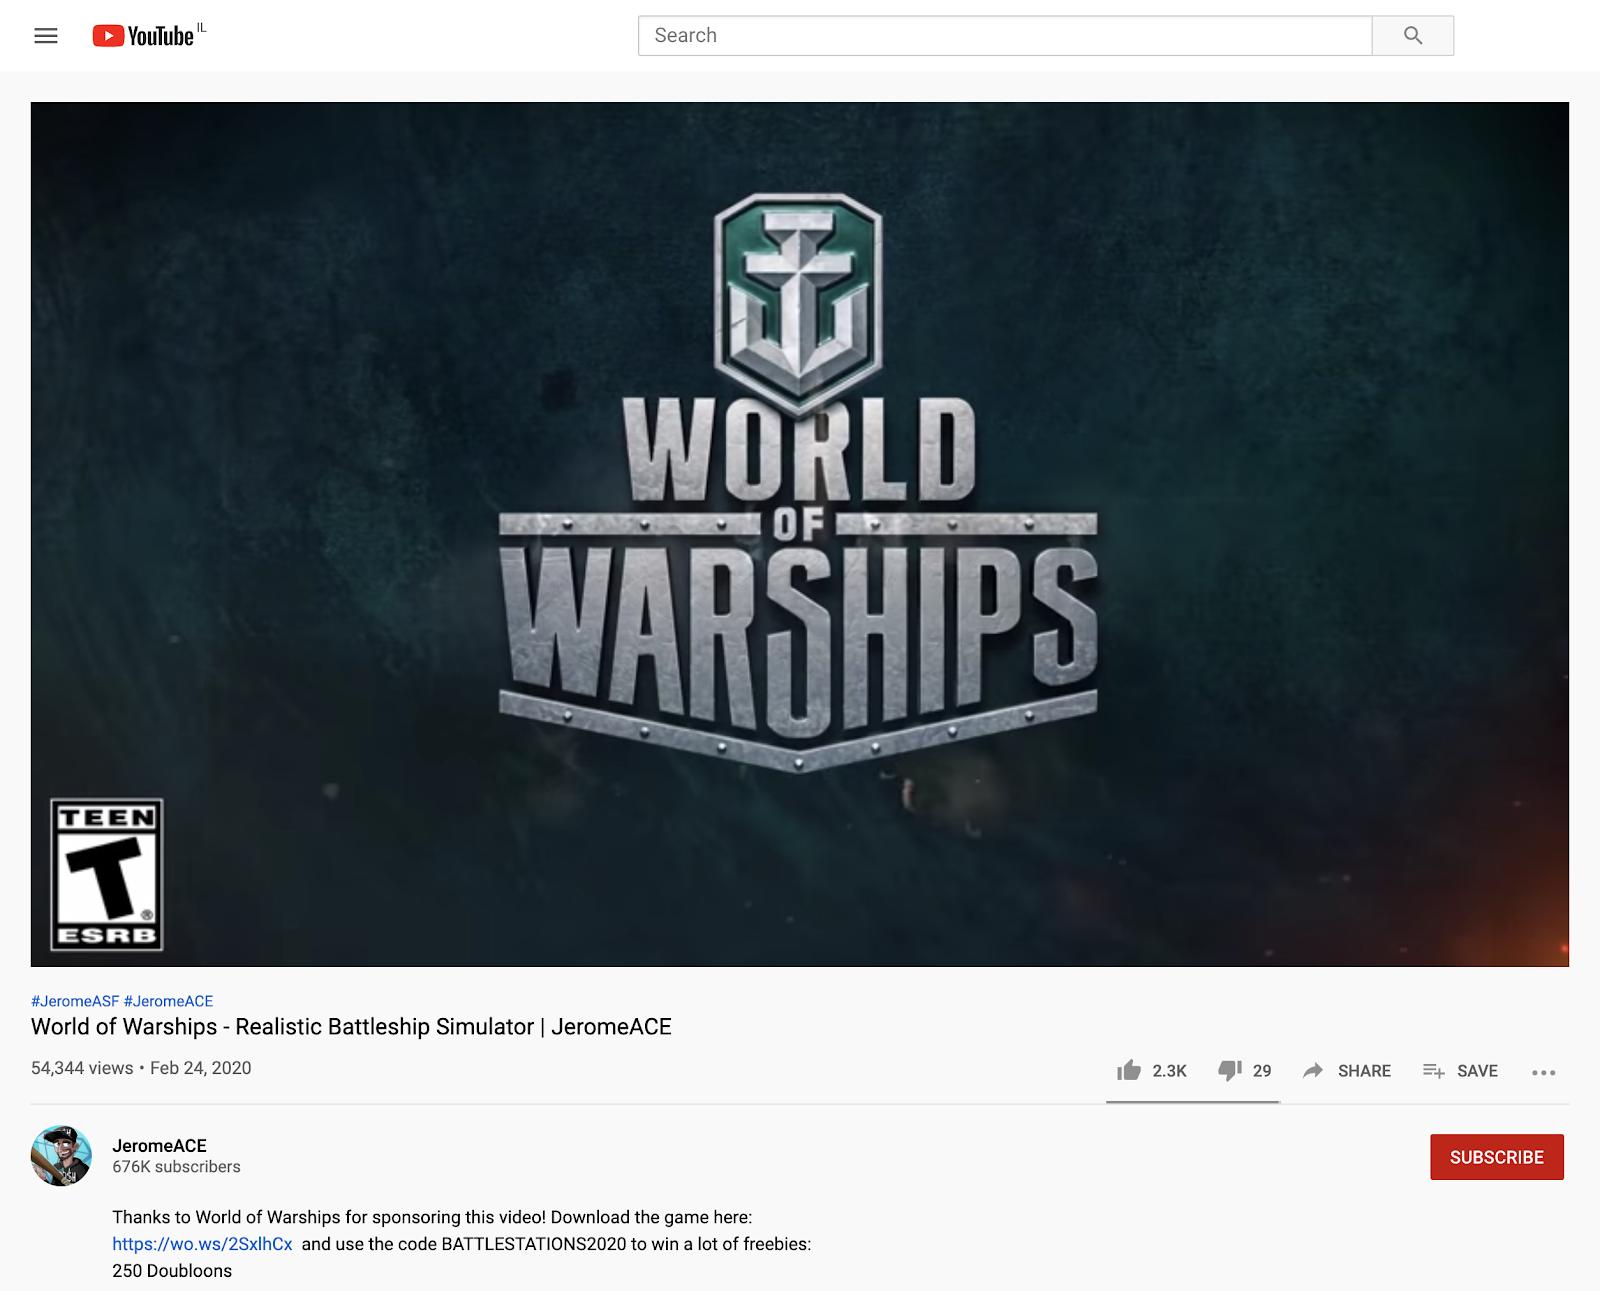 World of Warships dedicated video on YouTube